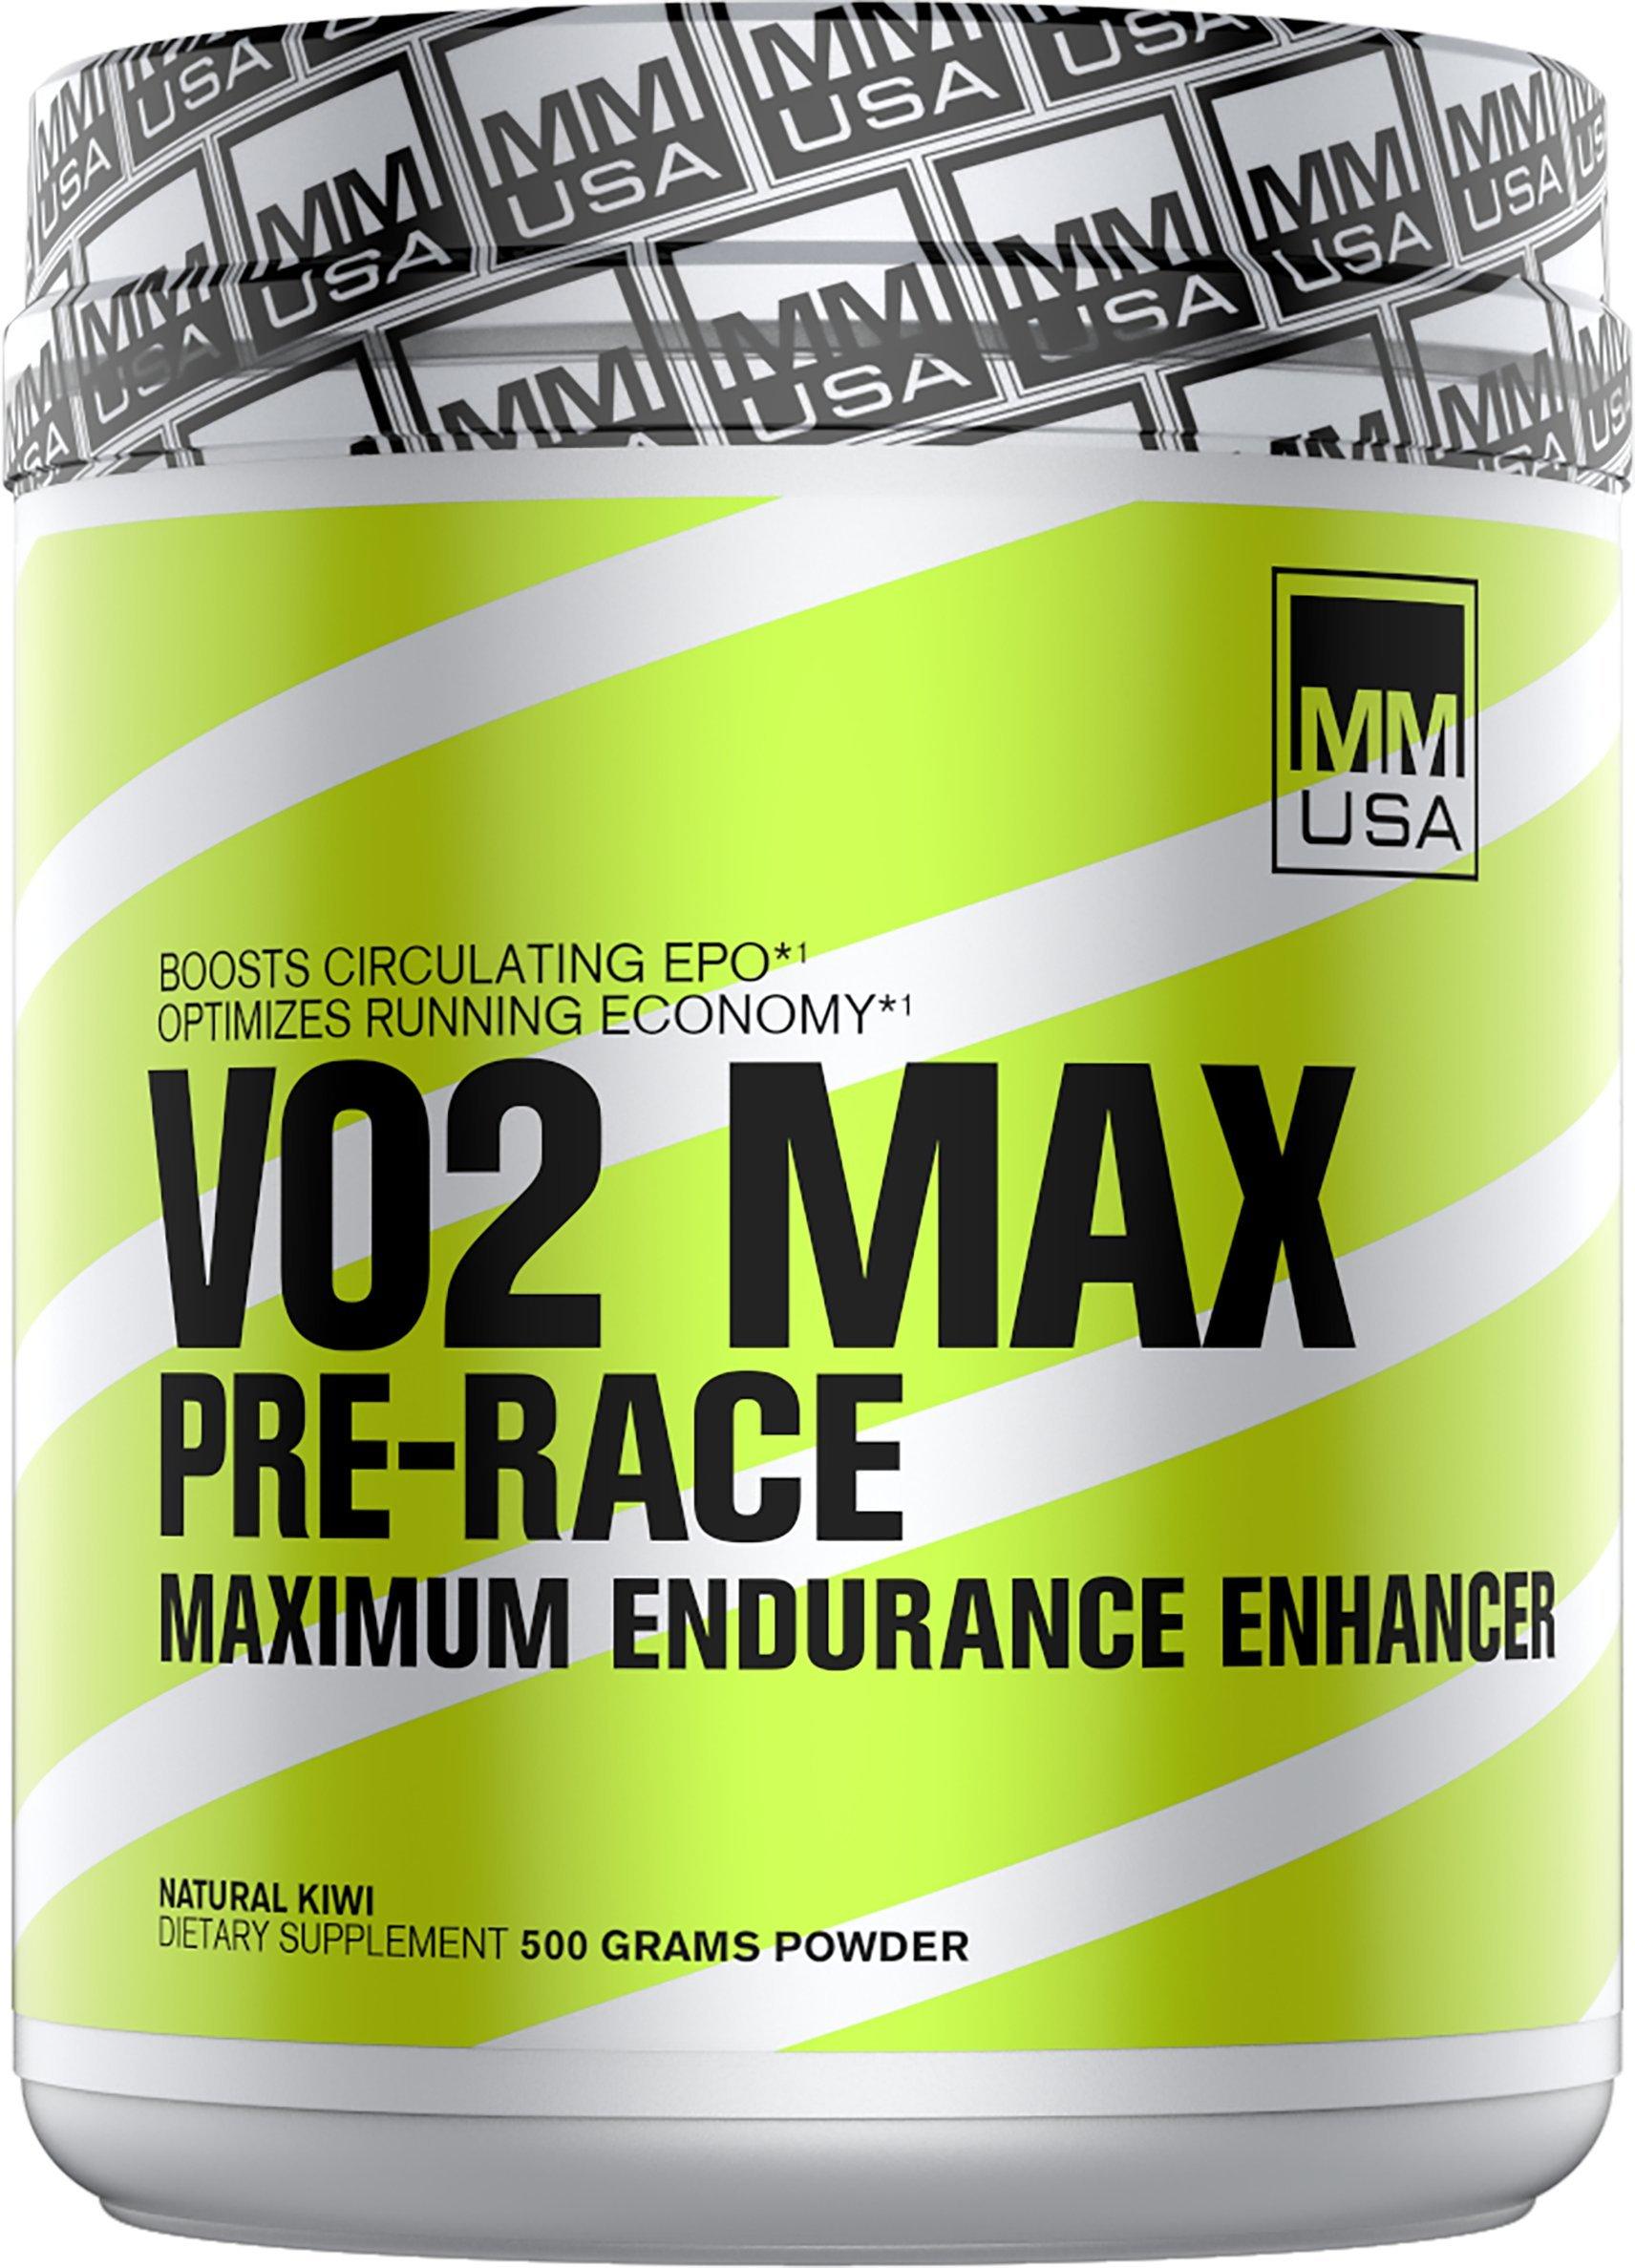 MMUSA VO2 MAX PRE-RACE MAXIMUM ENDURANCE ENHANCER, 500 Gram, Natural Kiwi